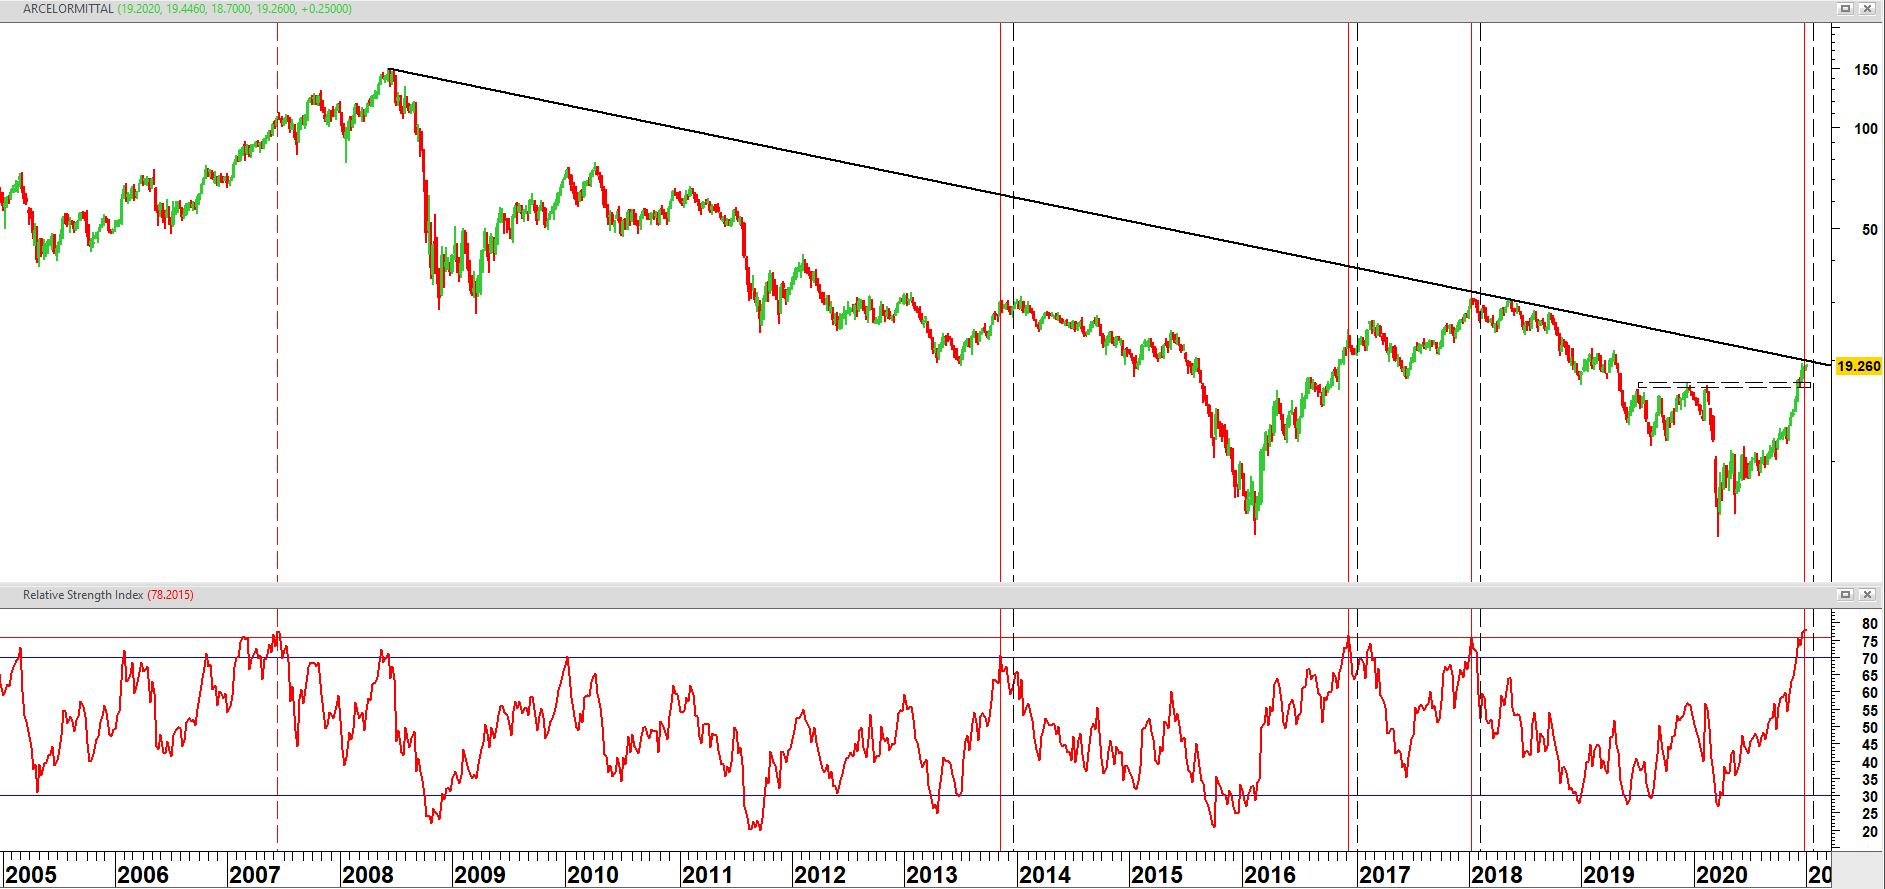 ArcelorMittal vanaf 2005 op weekbasis + relatieve sterkte index